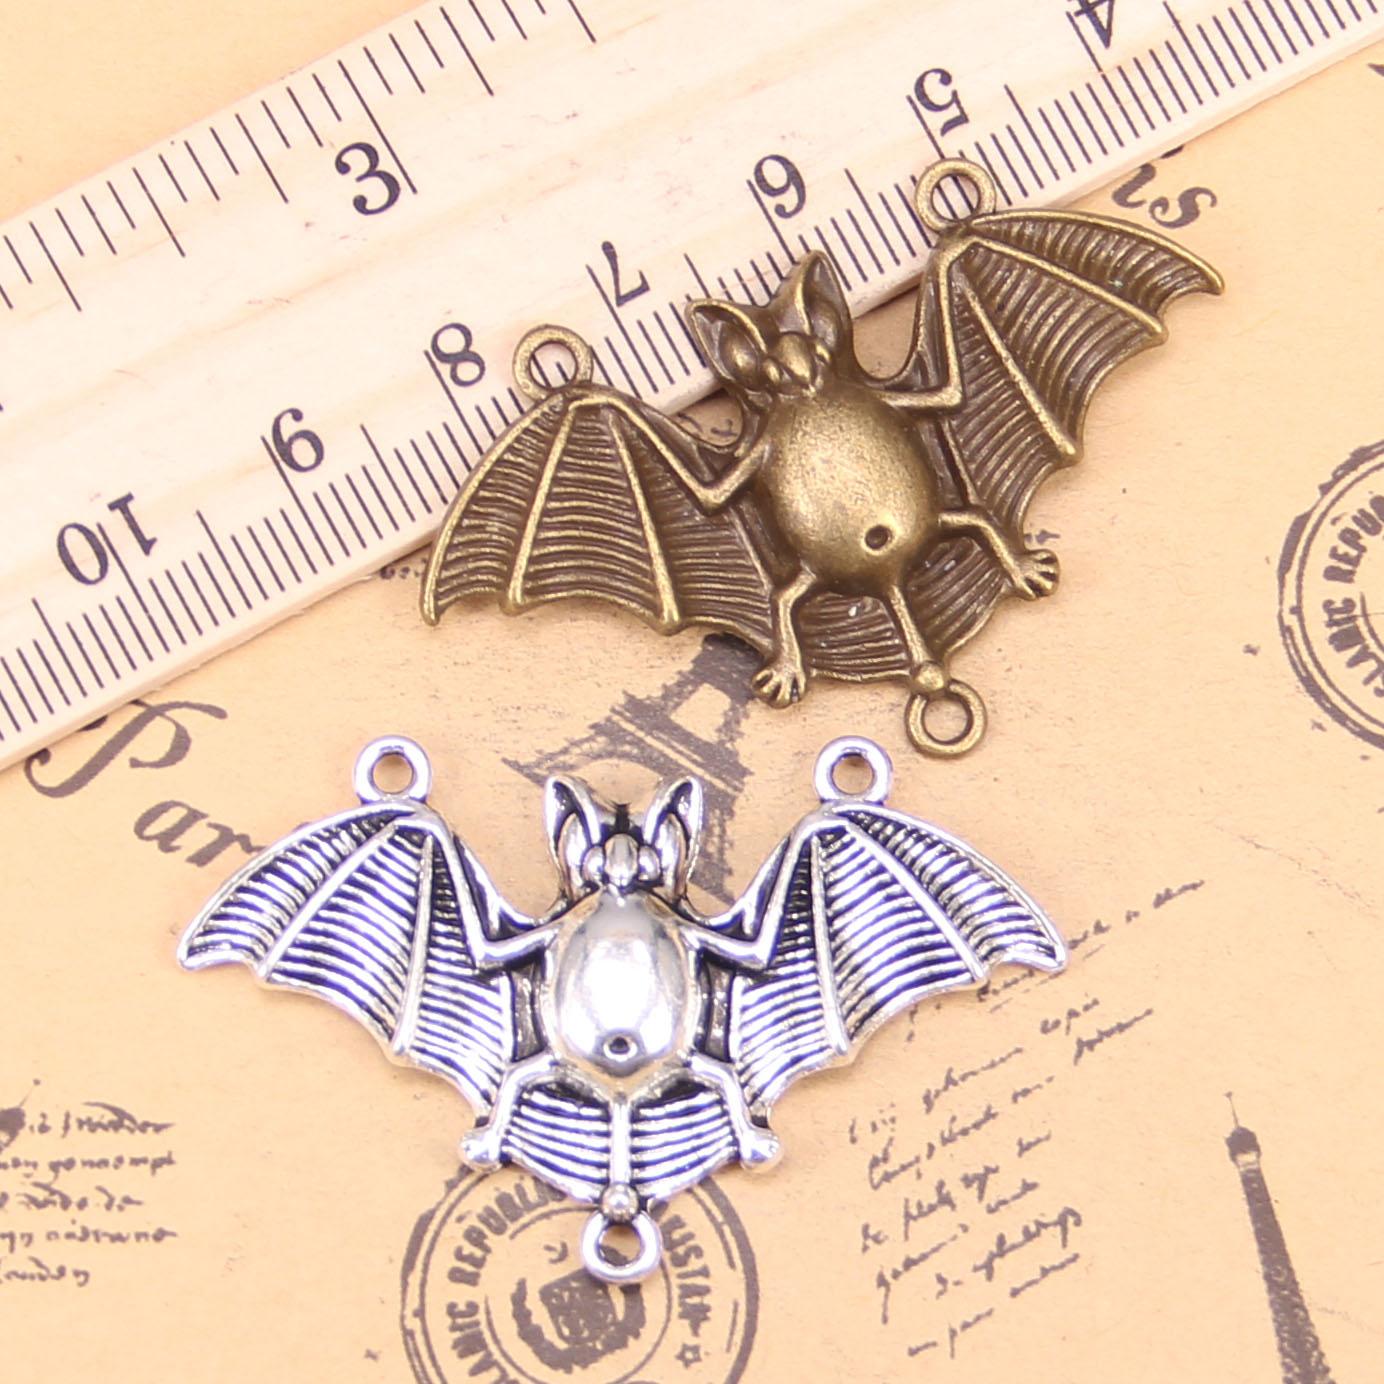 6 pçs encantos bat vampiro drácula conector 29x47mm pingentes antigos, jóias de bronze do vintage, diy para pulseira colar